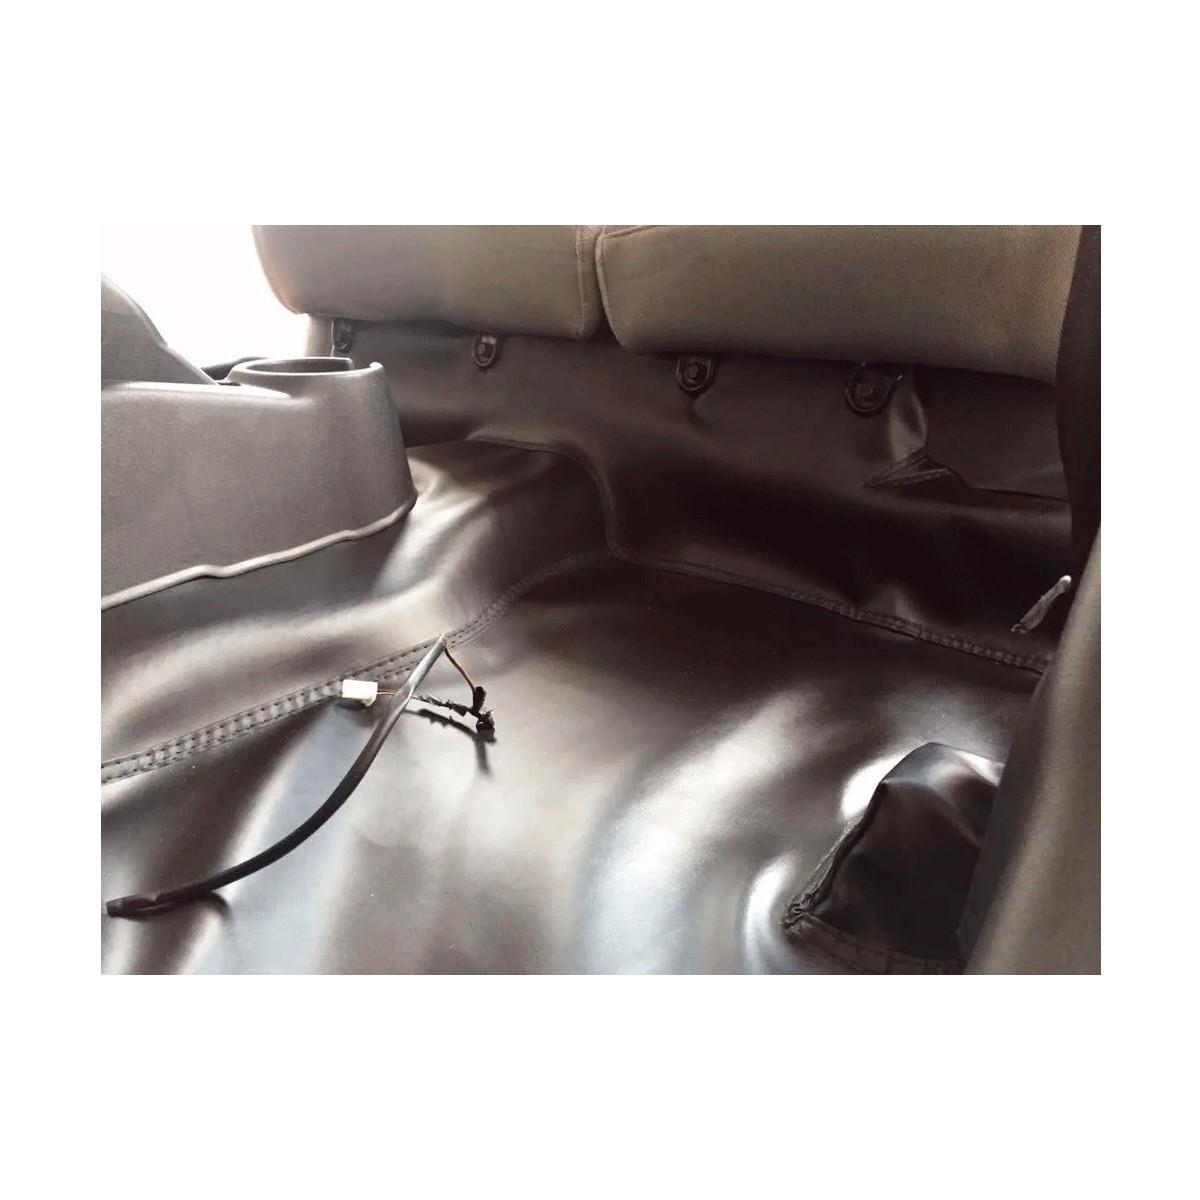 Tapete Automotivo Assoalho Emborrachado Bidim Volkswagen Polo 97 a 2001